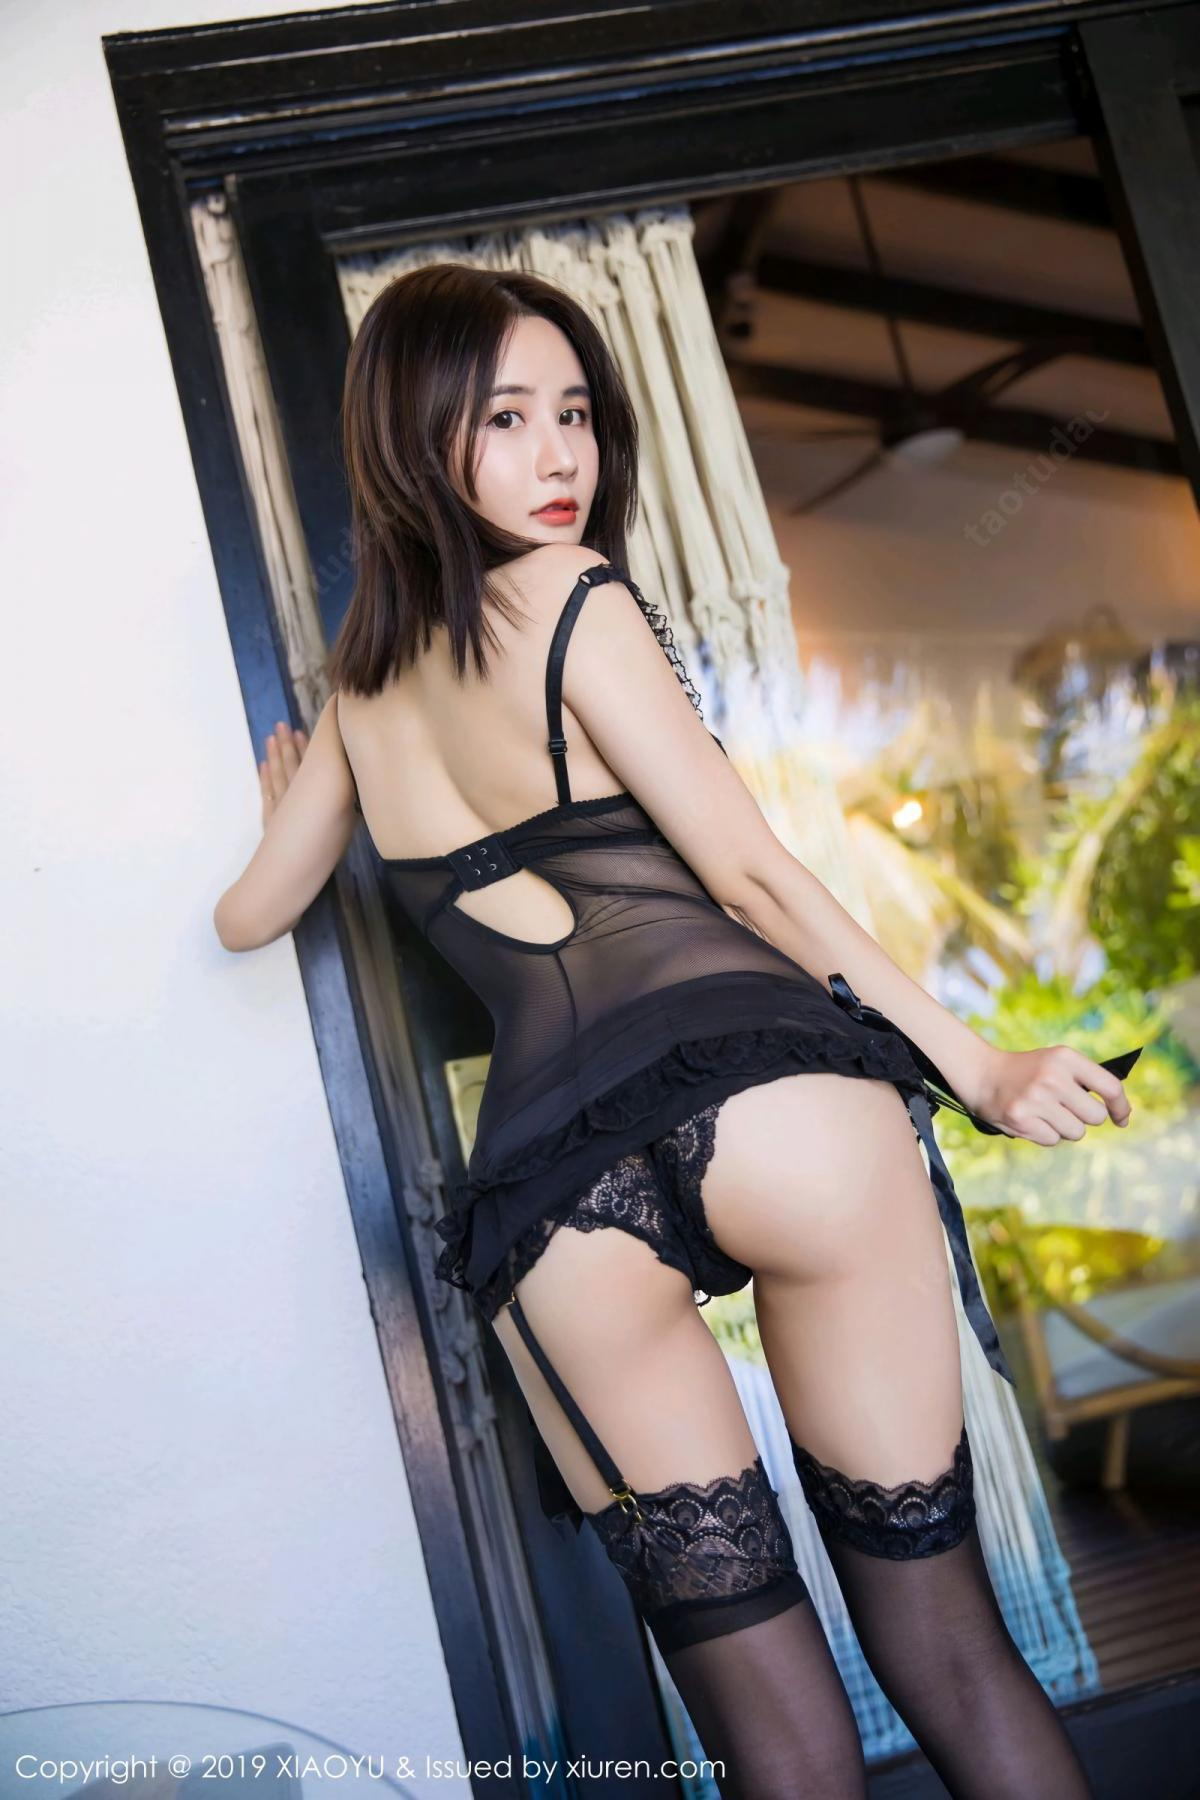 [XiaoYu] Vol.102 Lin Lin A I L I N 46P, Black Silk, Lin Lin Ailin, Tall, XiaoYu